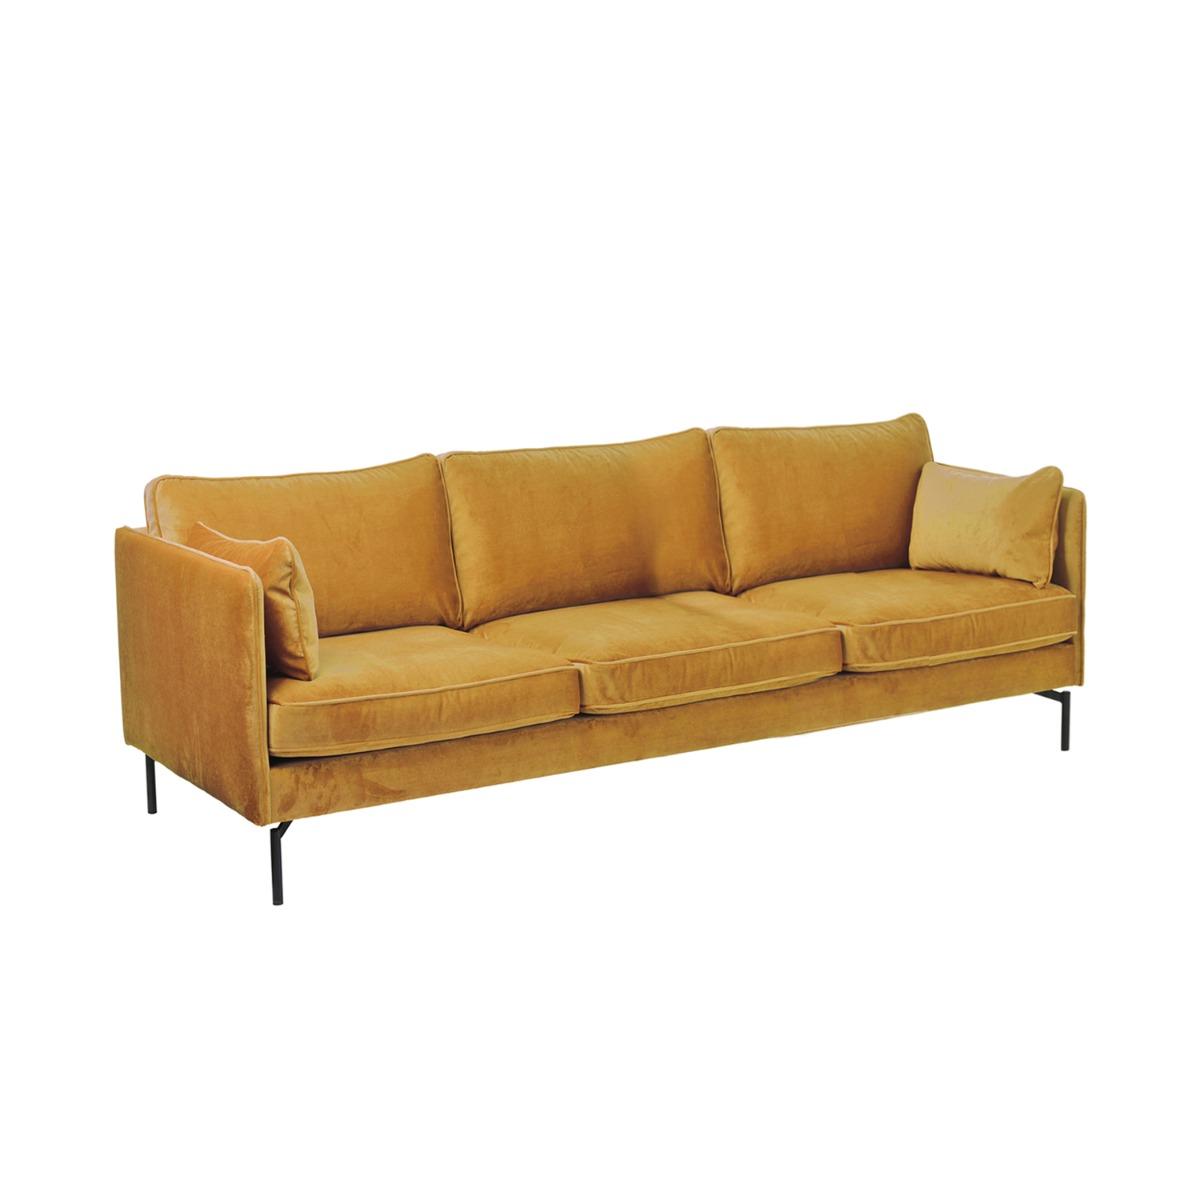 PPno.2 sofa XL Pols Potten goud